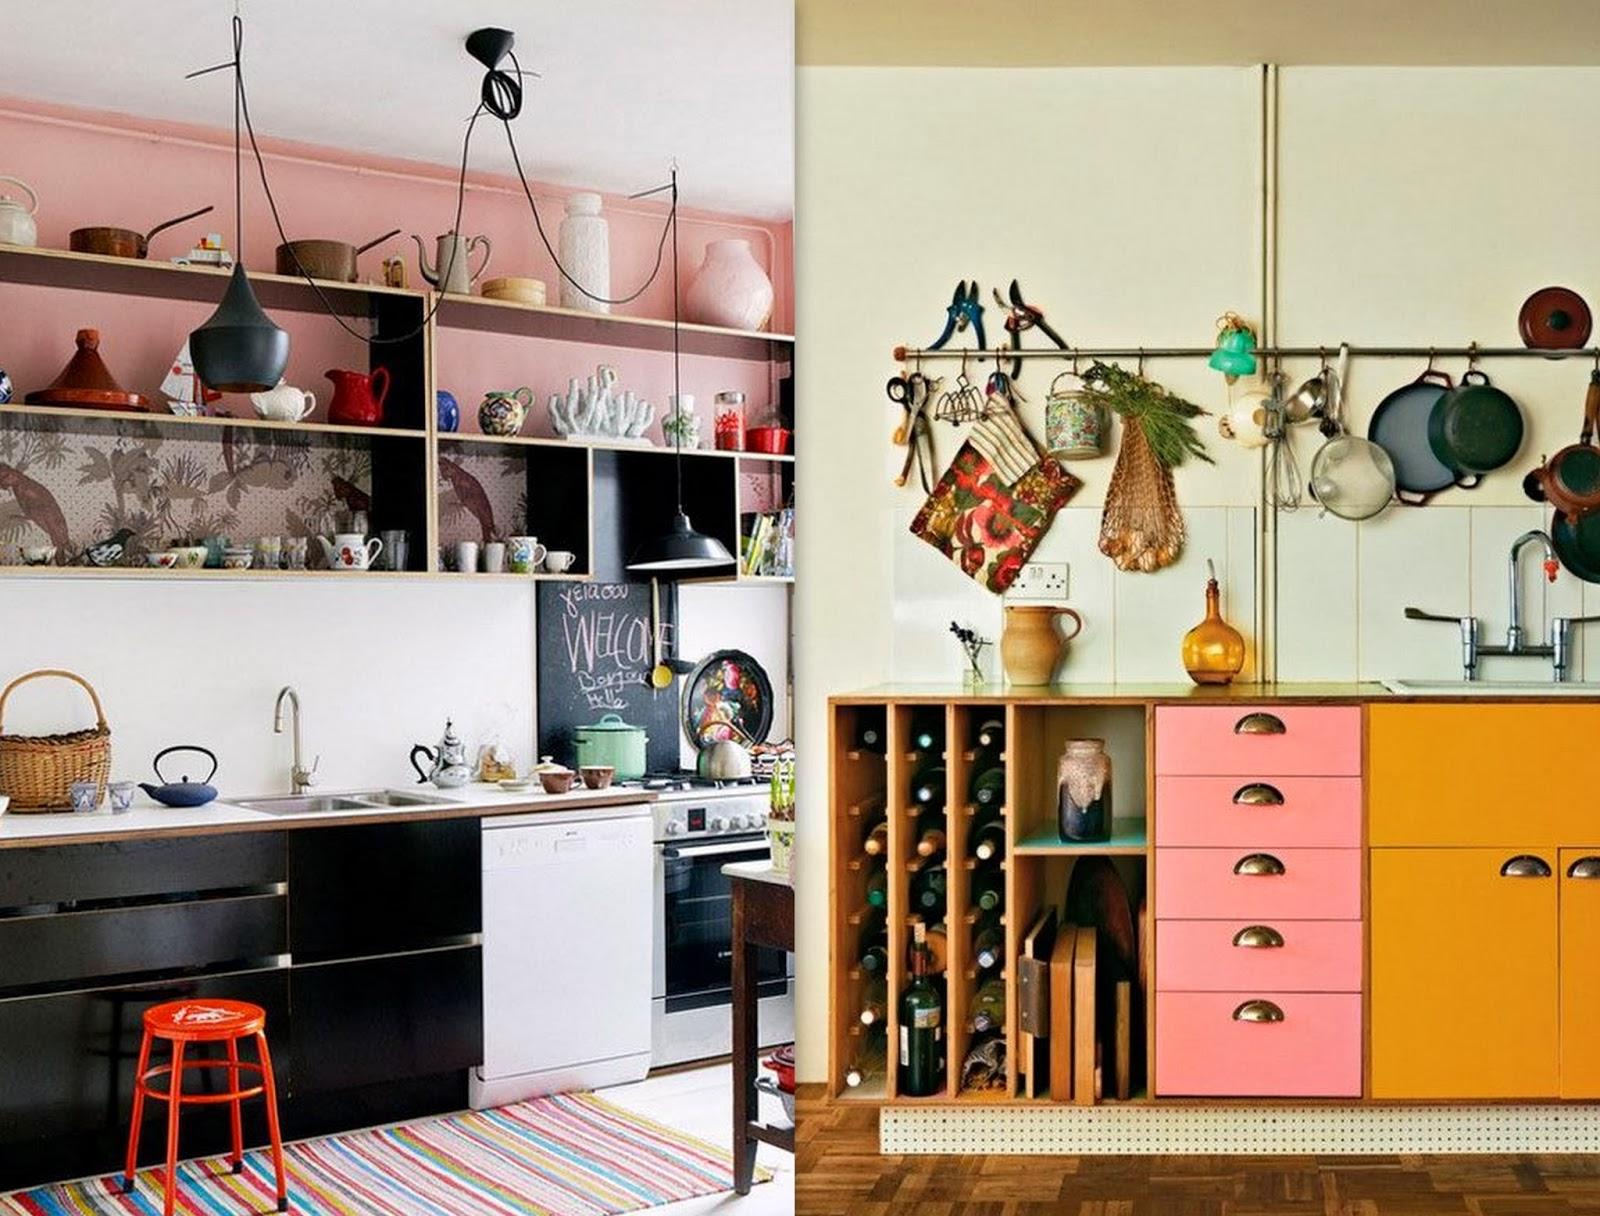 Galley Kitchen Ideas Pictures